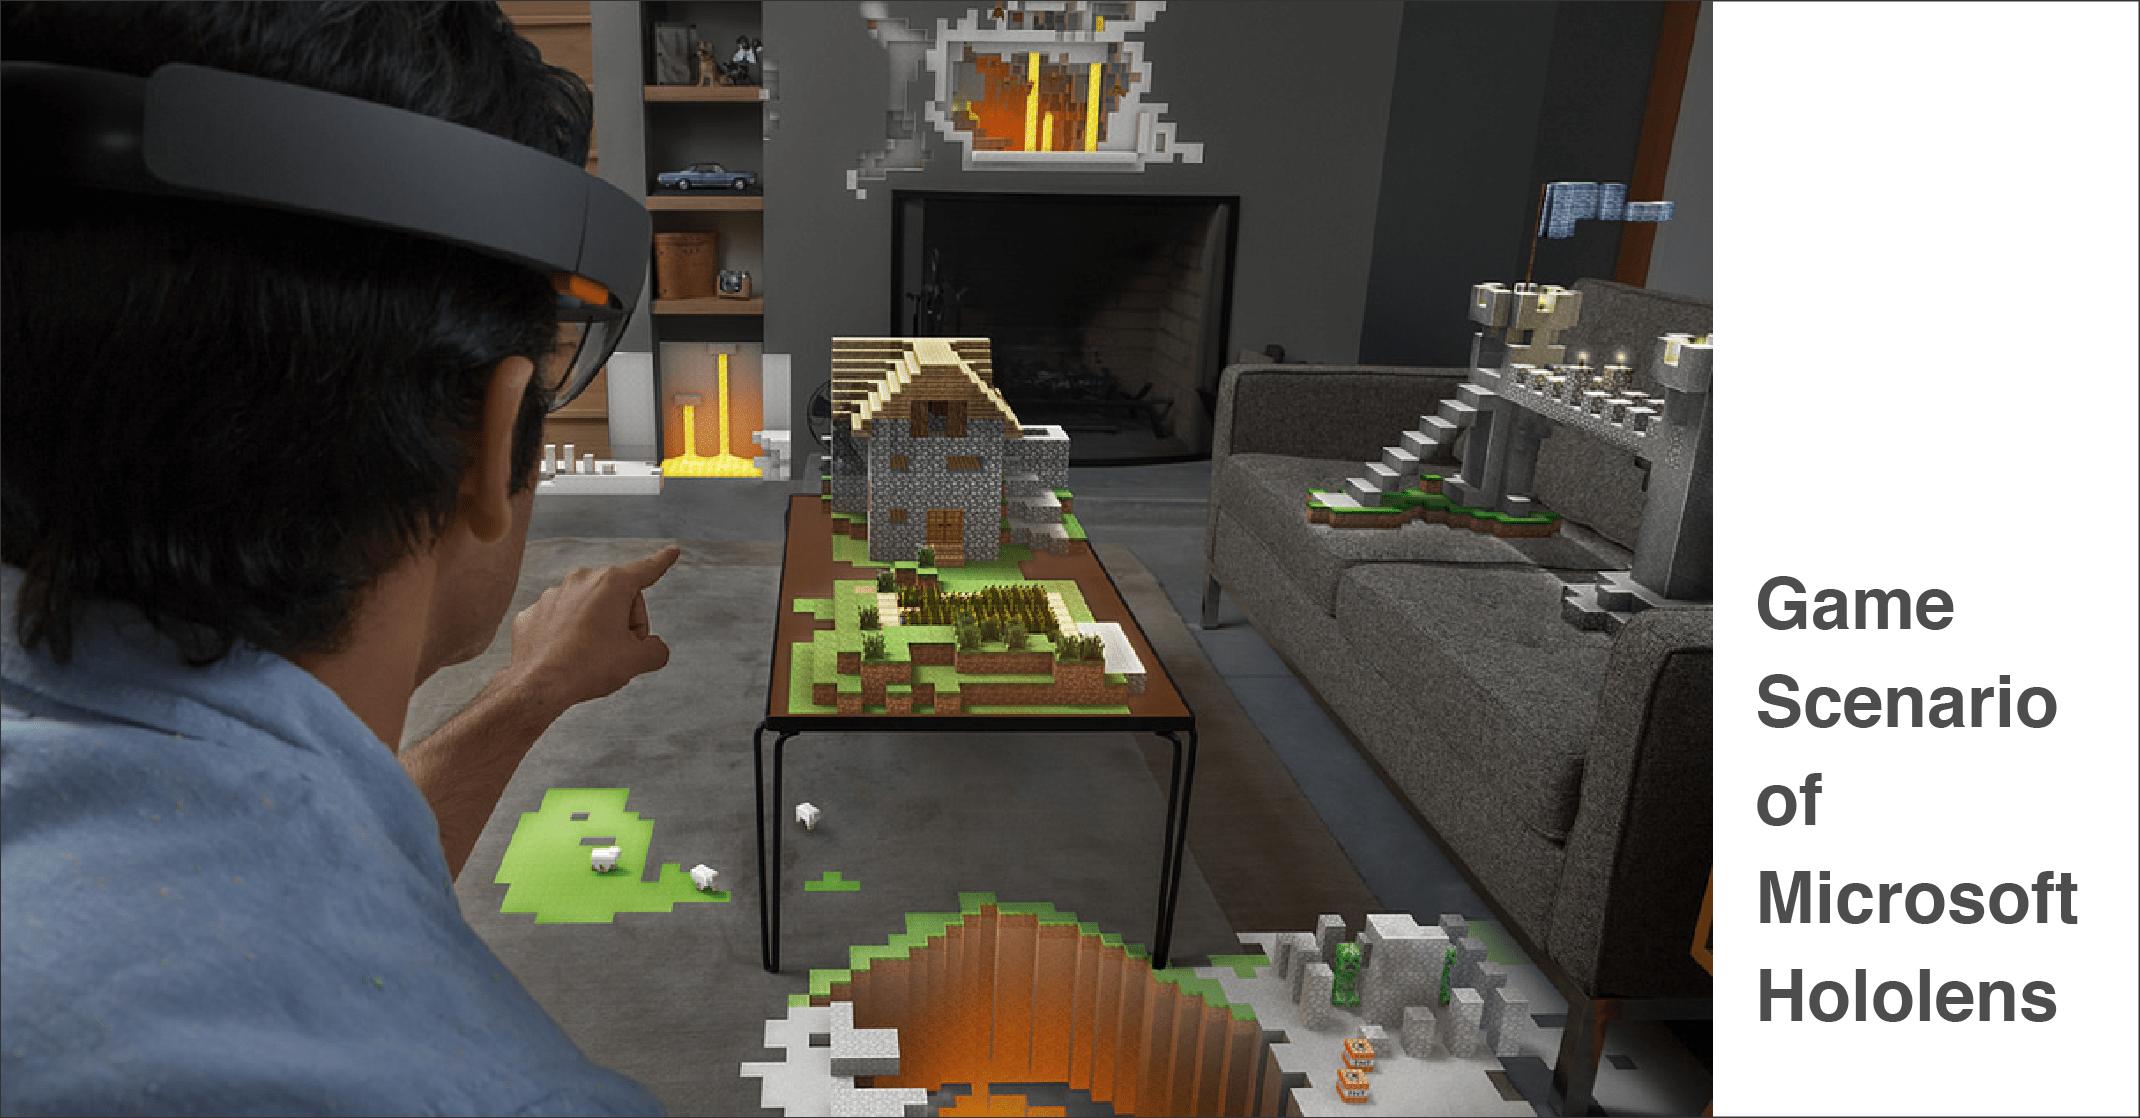 game scenario of Microsoft Hololens